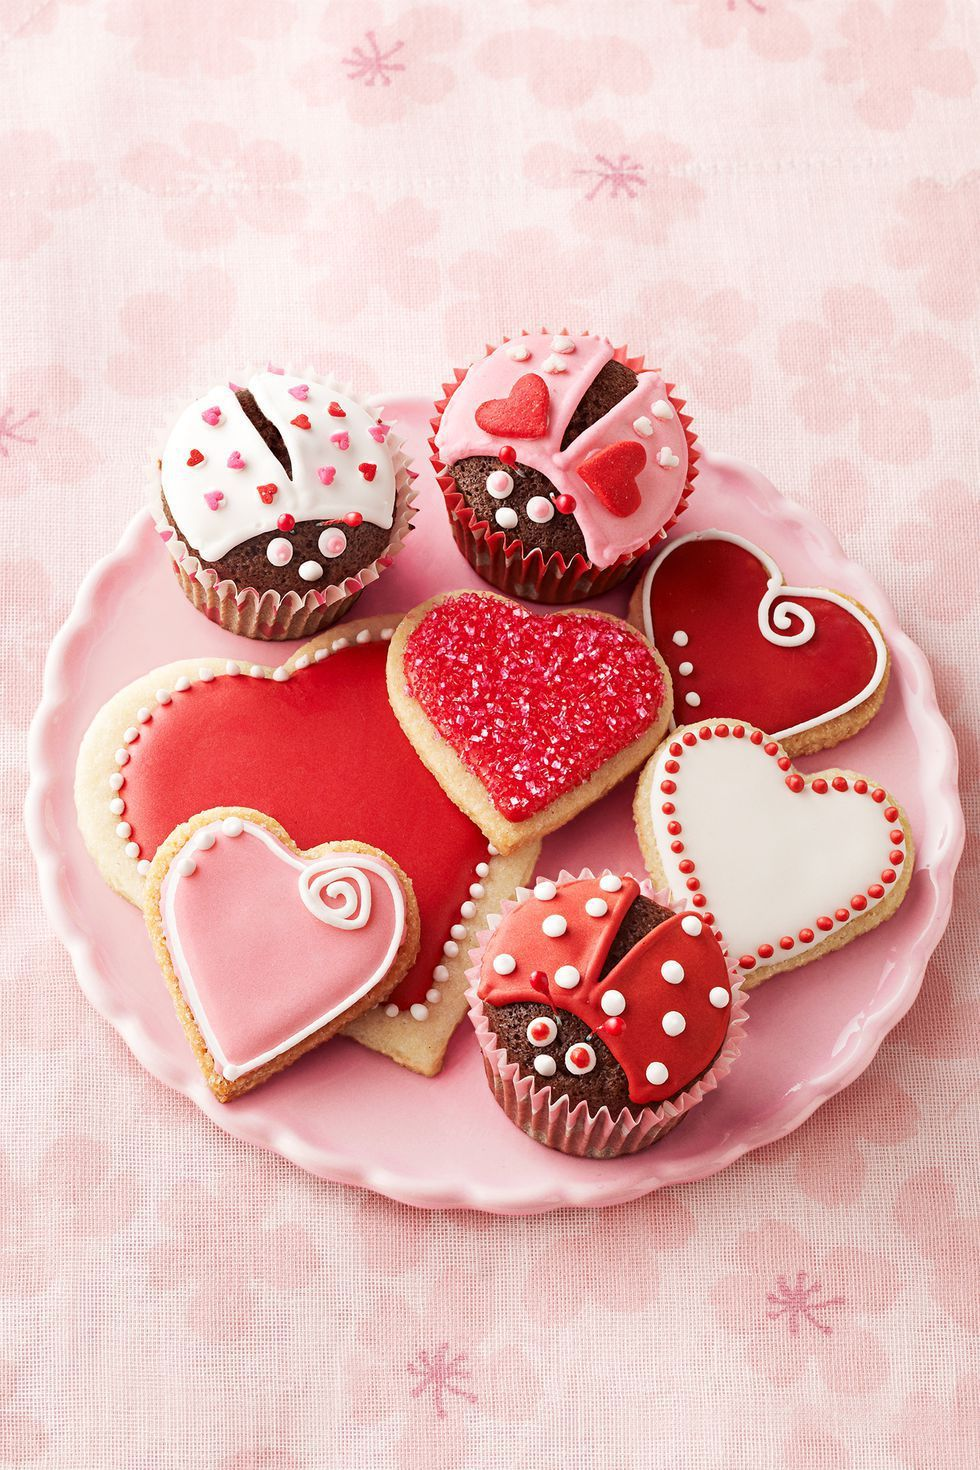 25 Best Valentine S Day Desserts Easy Recipes For Valentine S Day